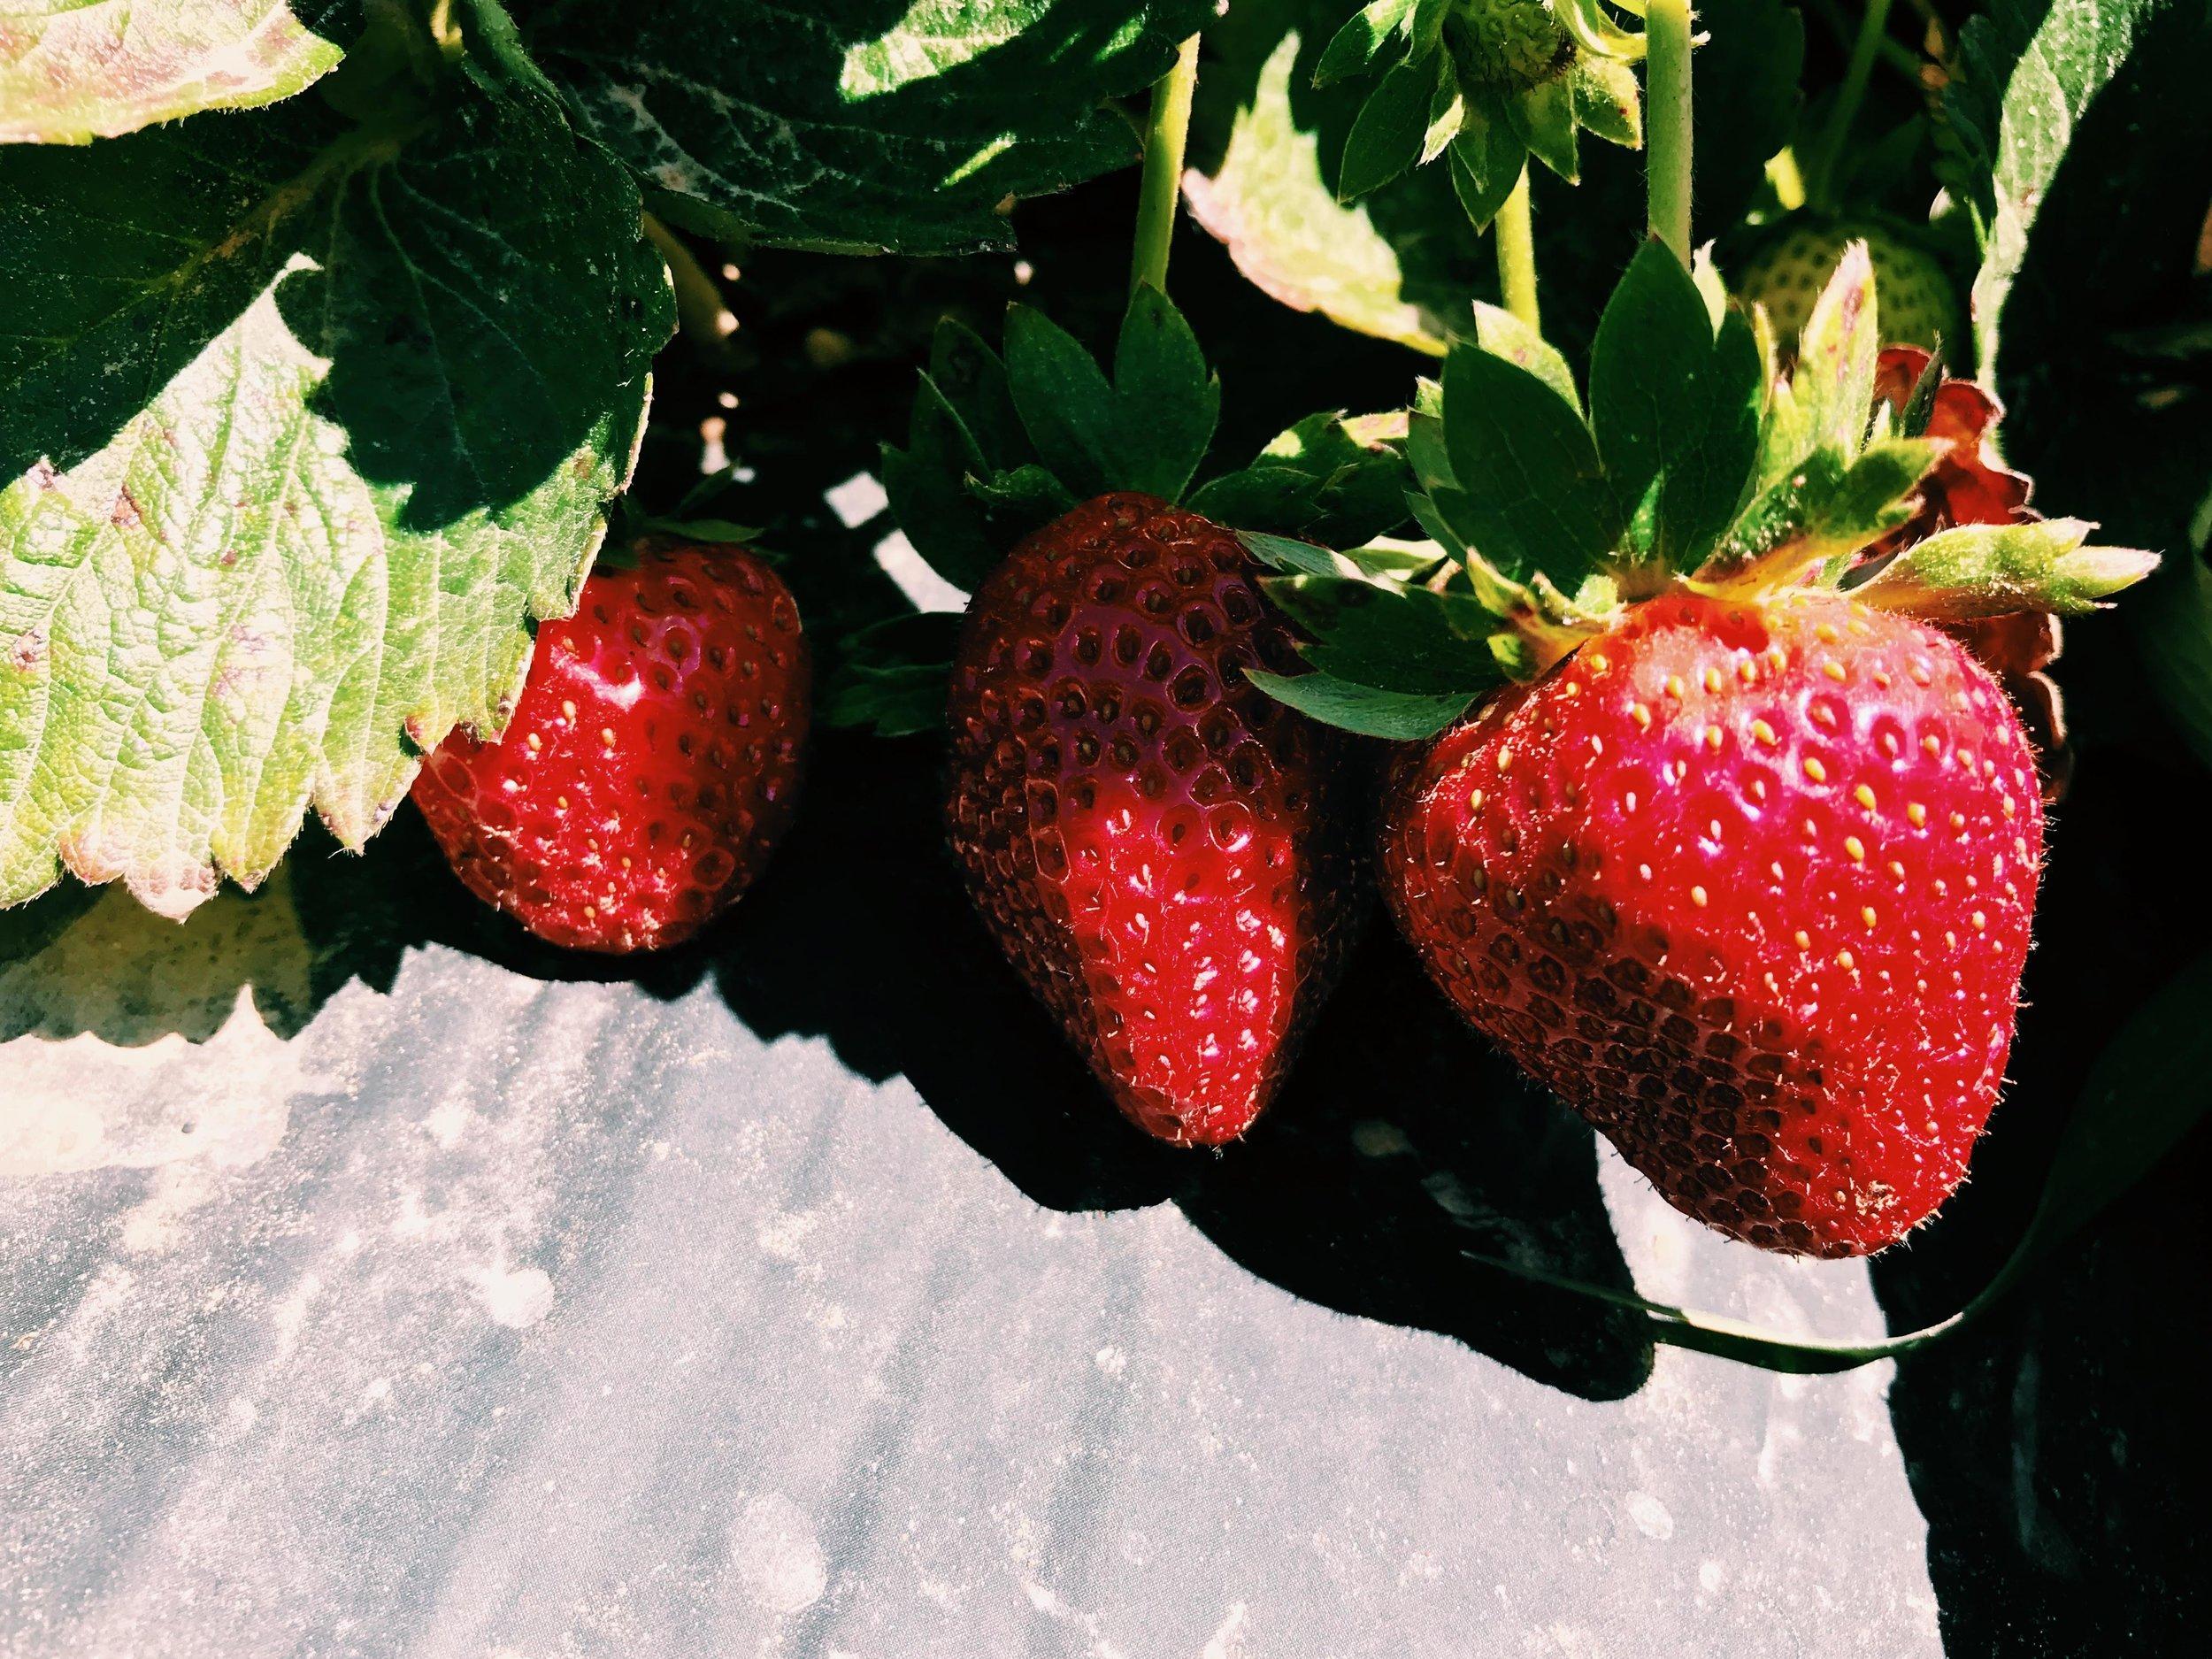 Three Heel Clicks - Strawberry Picking at Atkinson's Farms (14).jpg